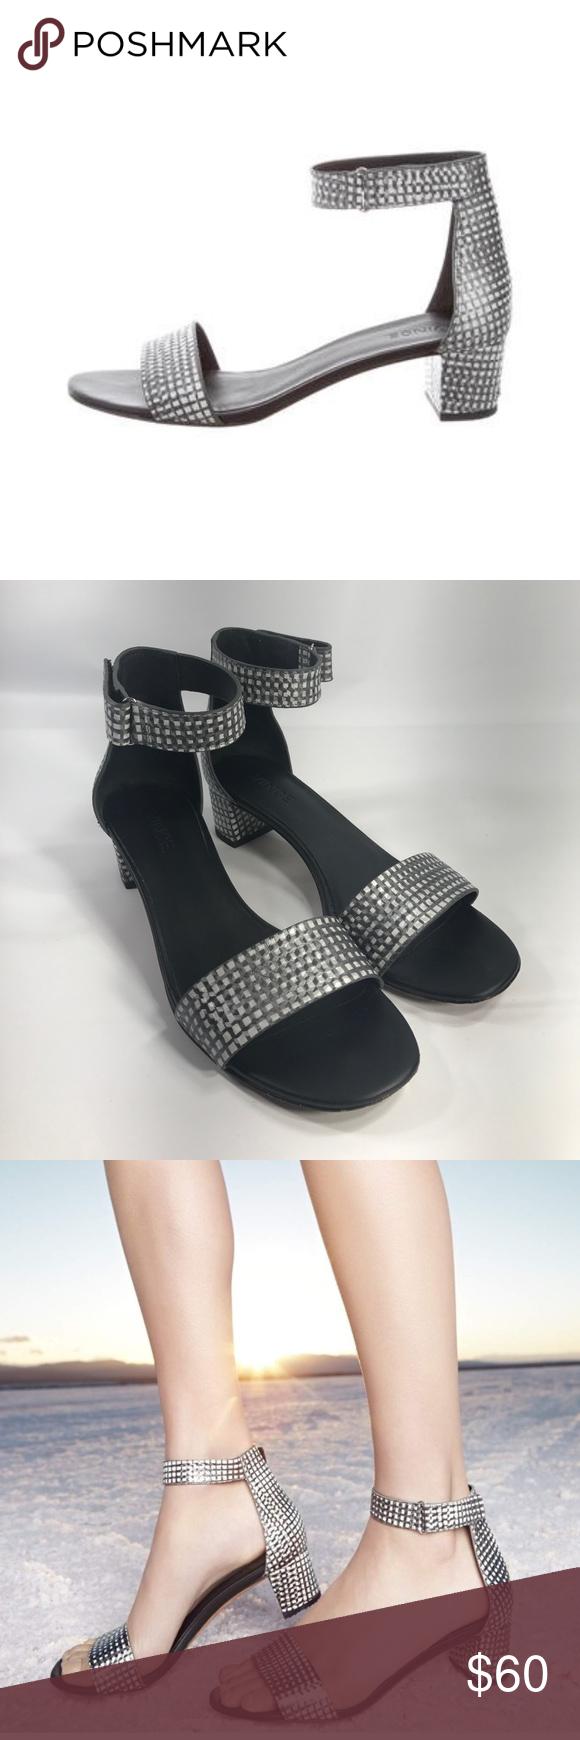 e4eafa63378 Vince. Rita Ankle Strap Sandal Excellent preowned condition